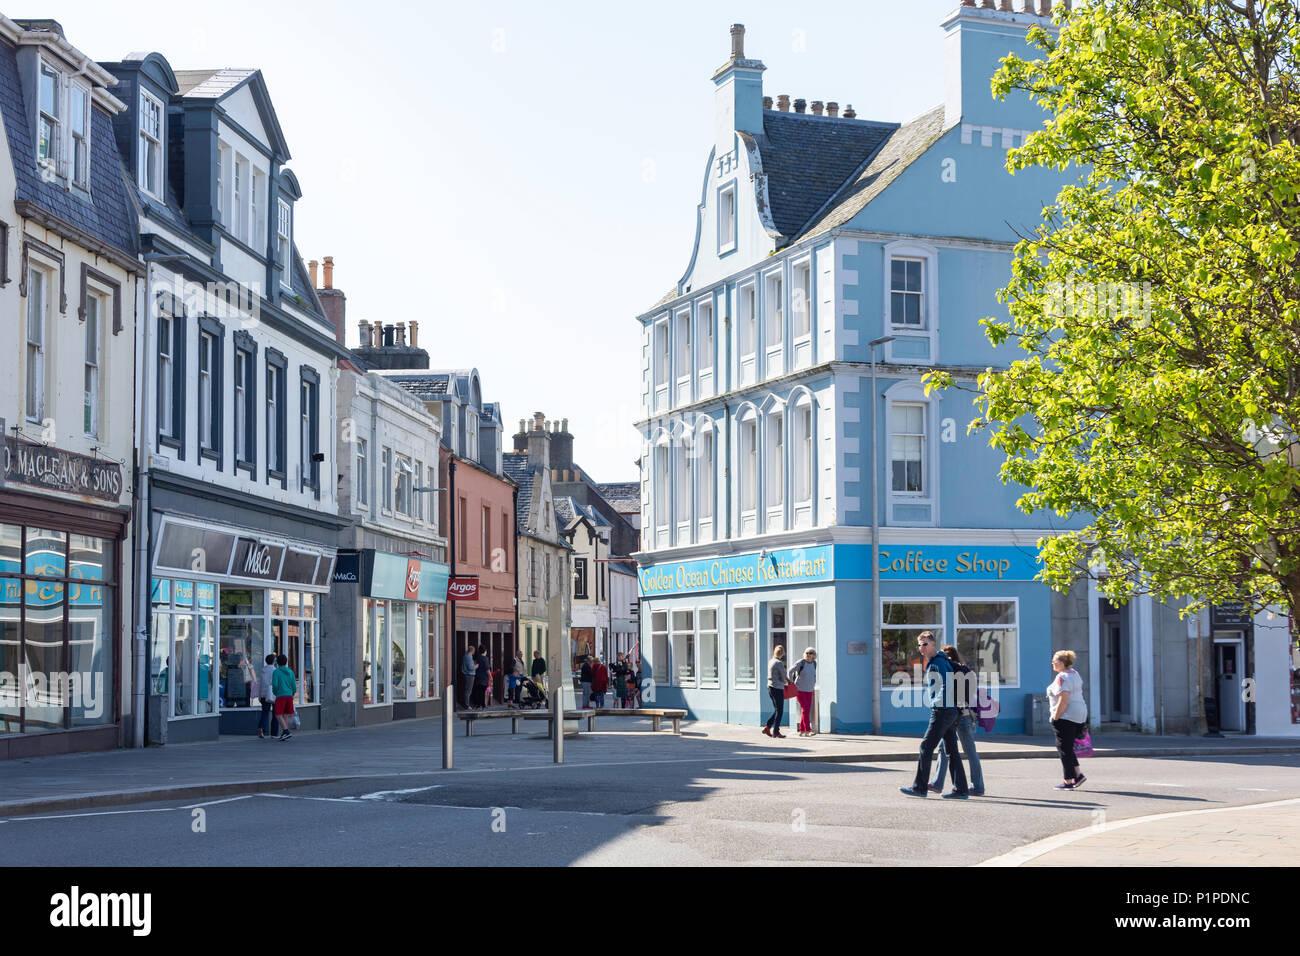 Pedestrianised Cromwell Street, Stornoway, Isle of Lewis, Outer Hebrides, Scotland, United Kingdom - Stock Image